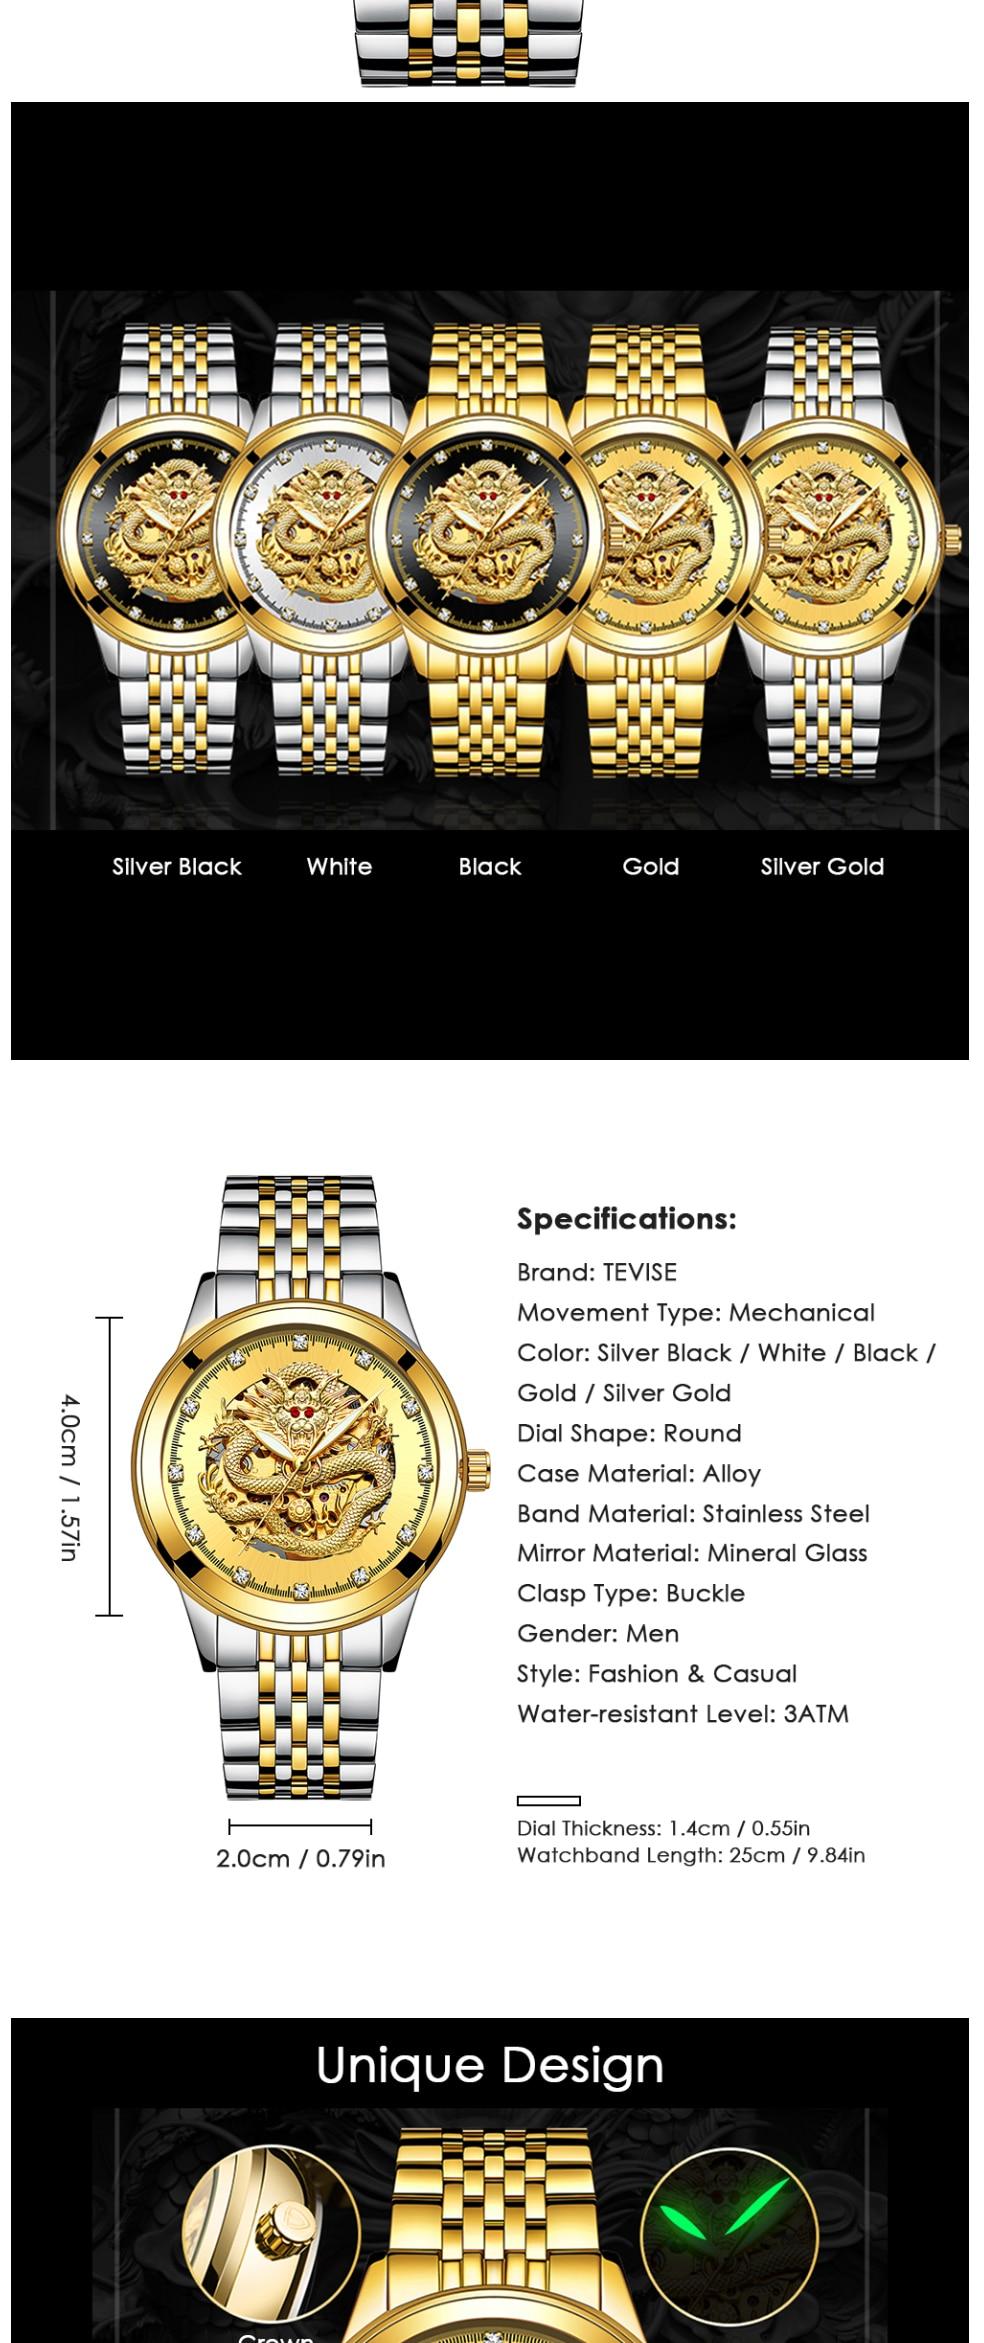 HTB1UwUbgAzoK1RjSZFlq6yi4VXah TEVISE Men Mechanical Watch Luxurious Automatic Winding Watches Waterproof Skeleton Hollow Gold Dragon Clock Relogio Masculino